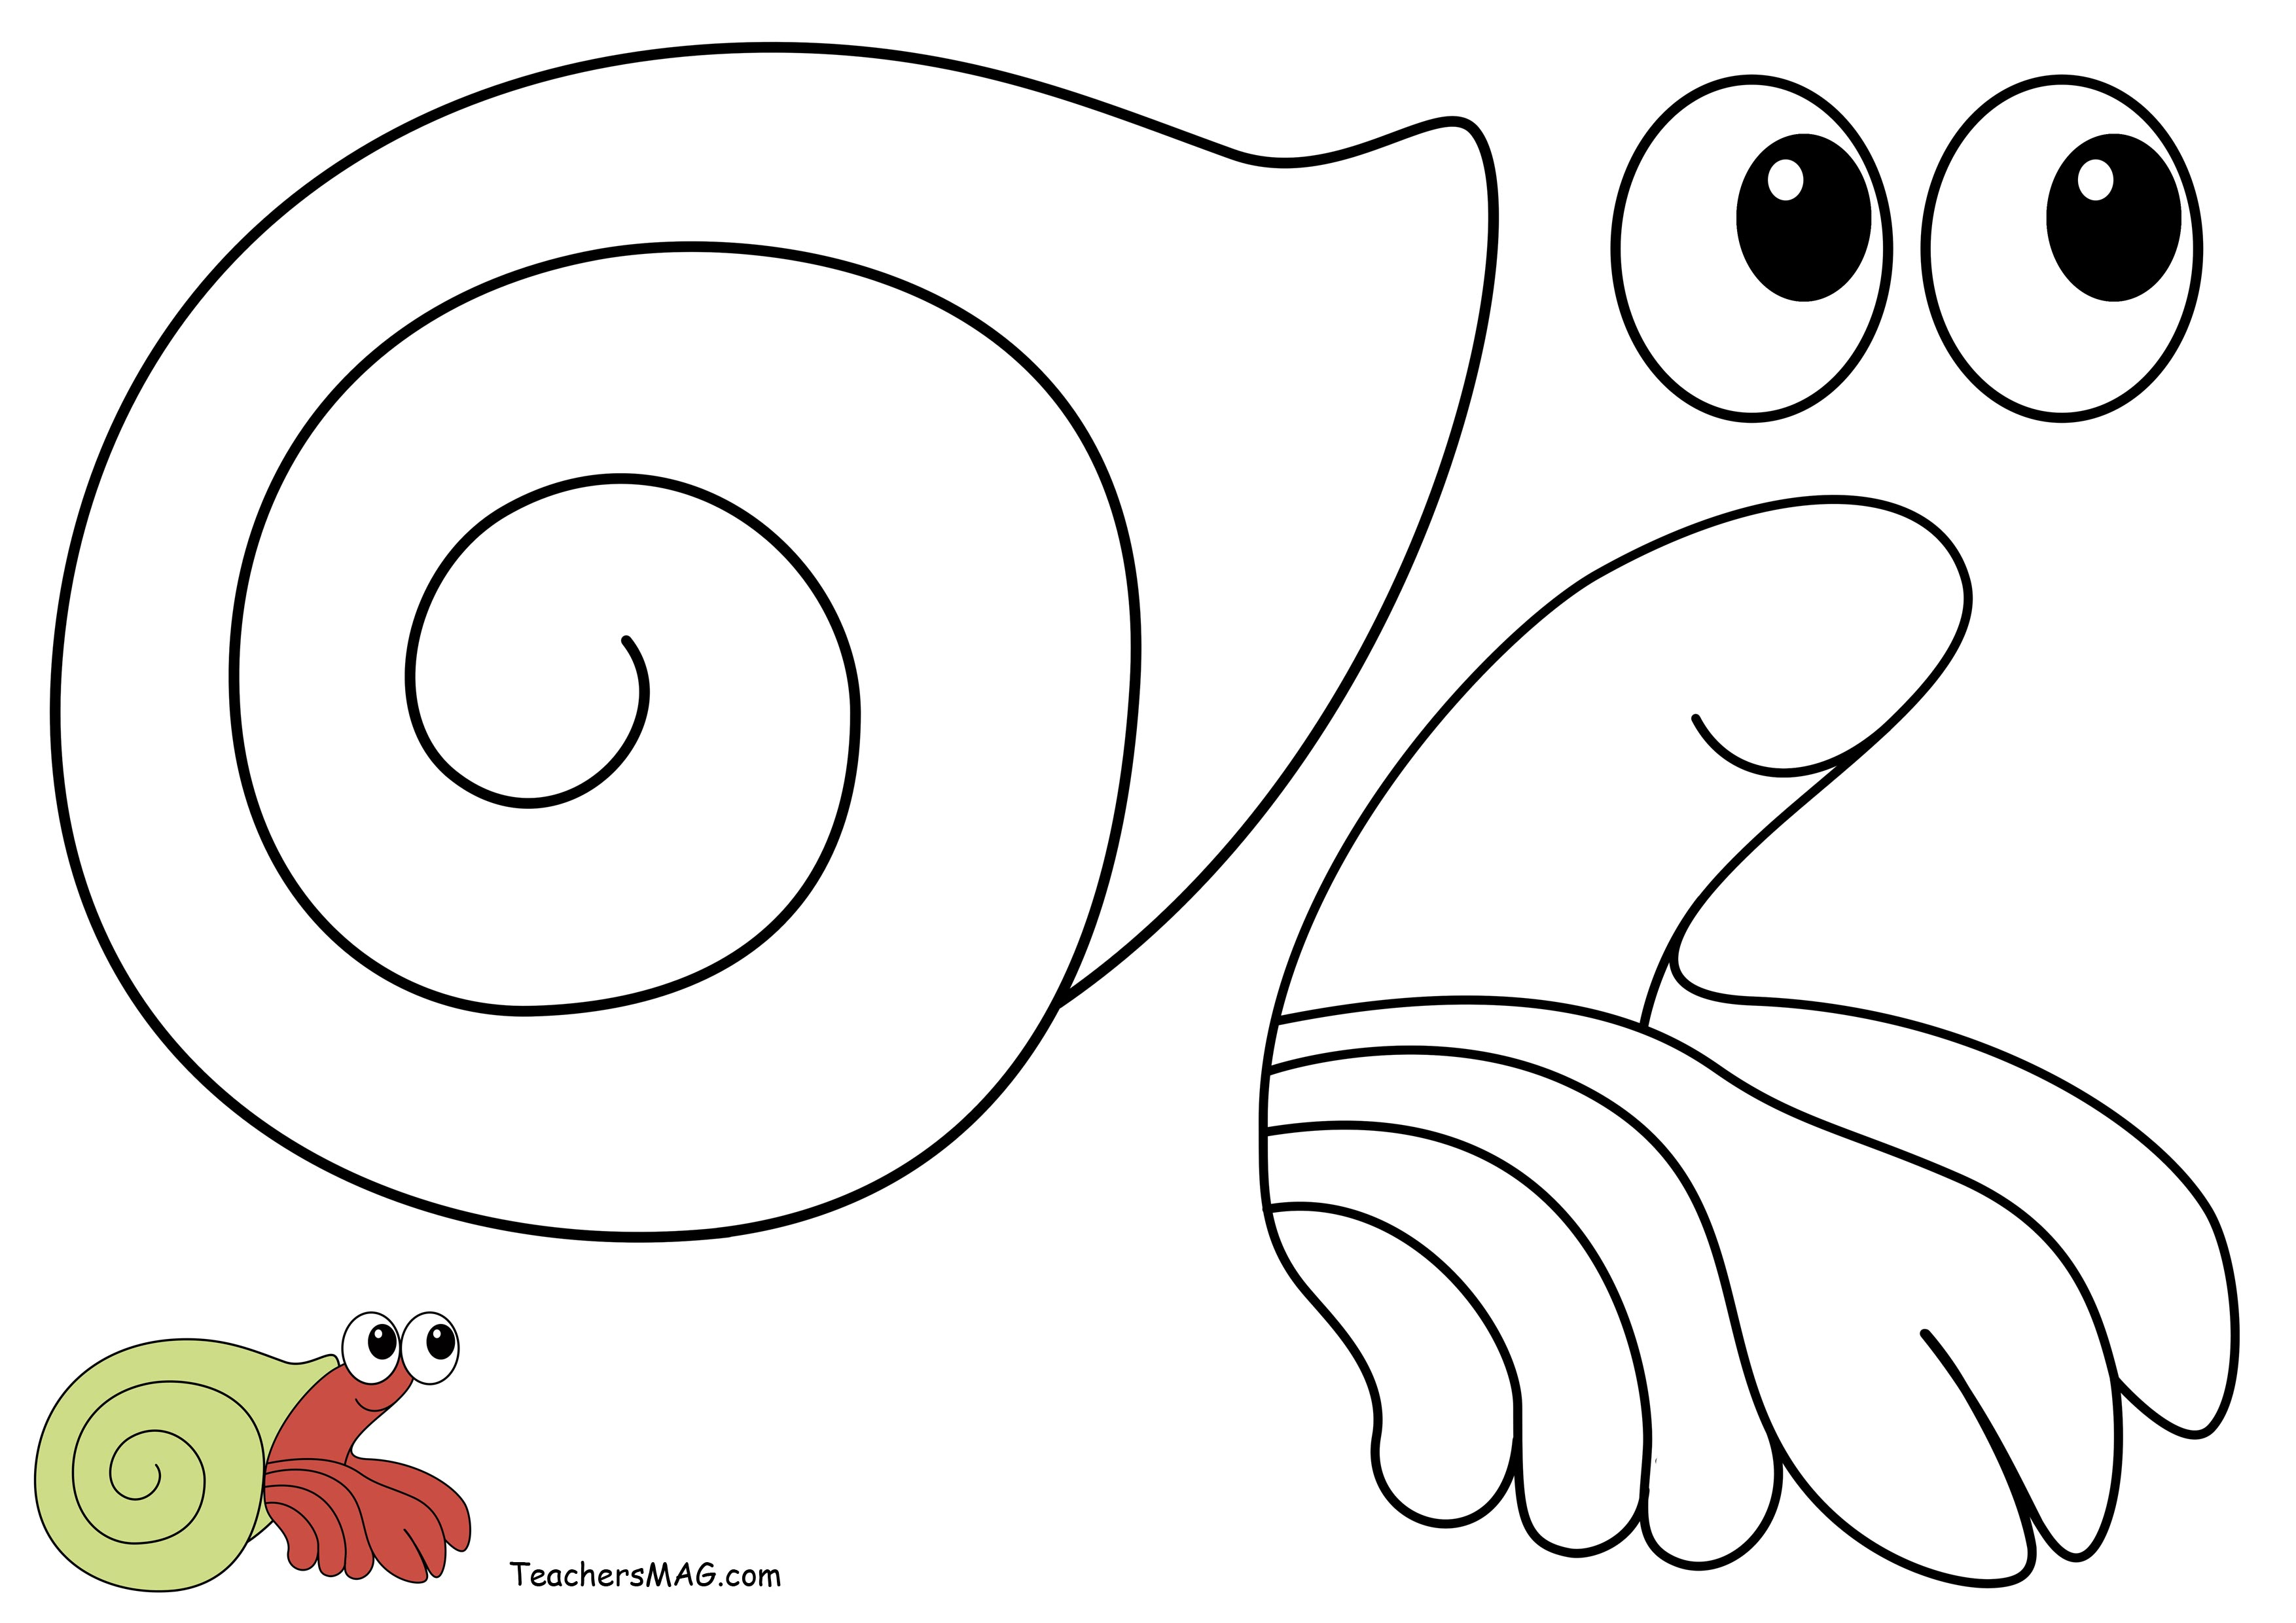 A House For Hermit Crab Craft For Preschoolers Printable Teachersmag Com